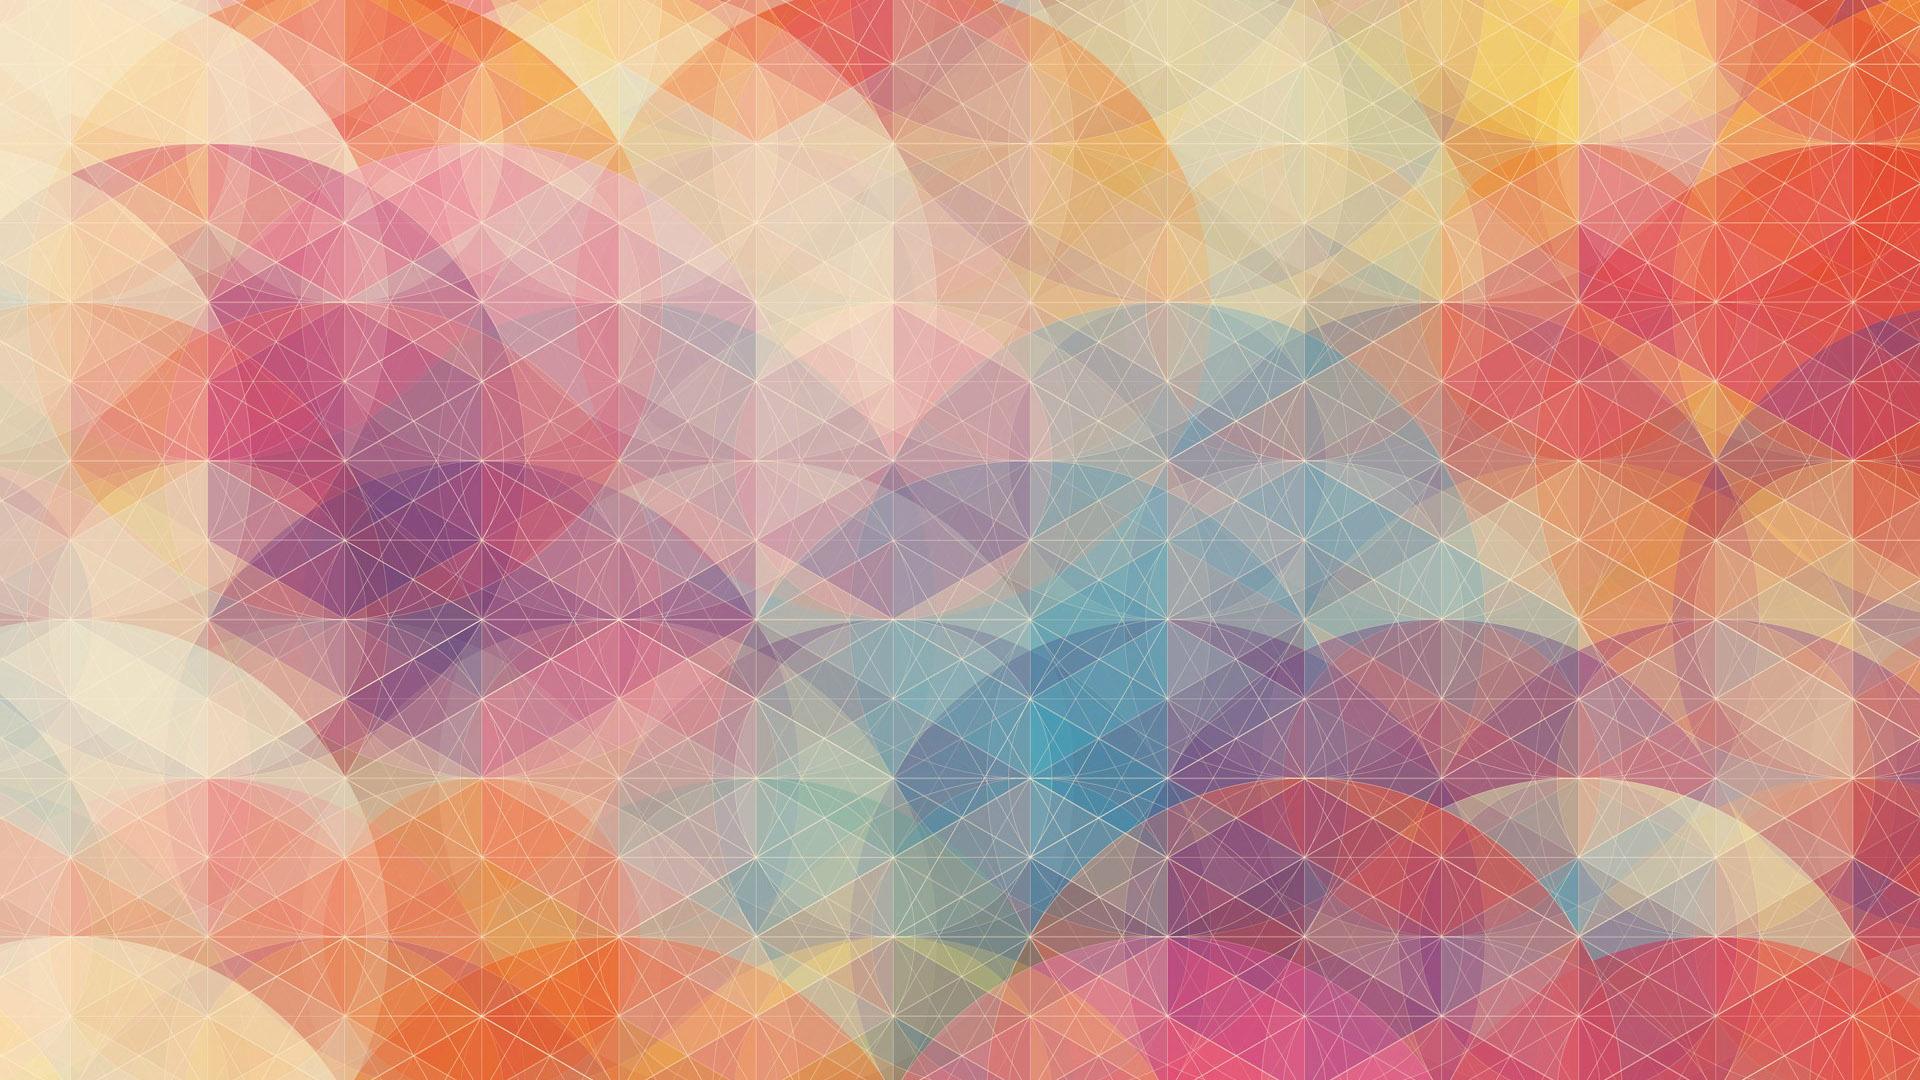 Must see Wallpaper Mac Geometric - Geometric-Desktop-Backgrounds-006  Photograph_583823.jpg